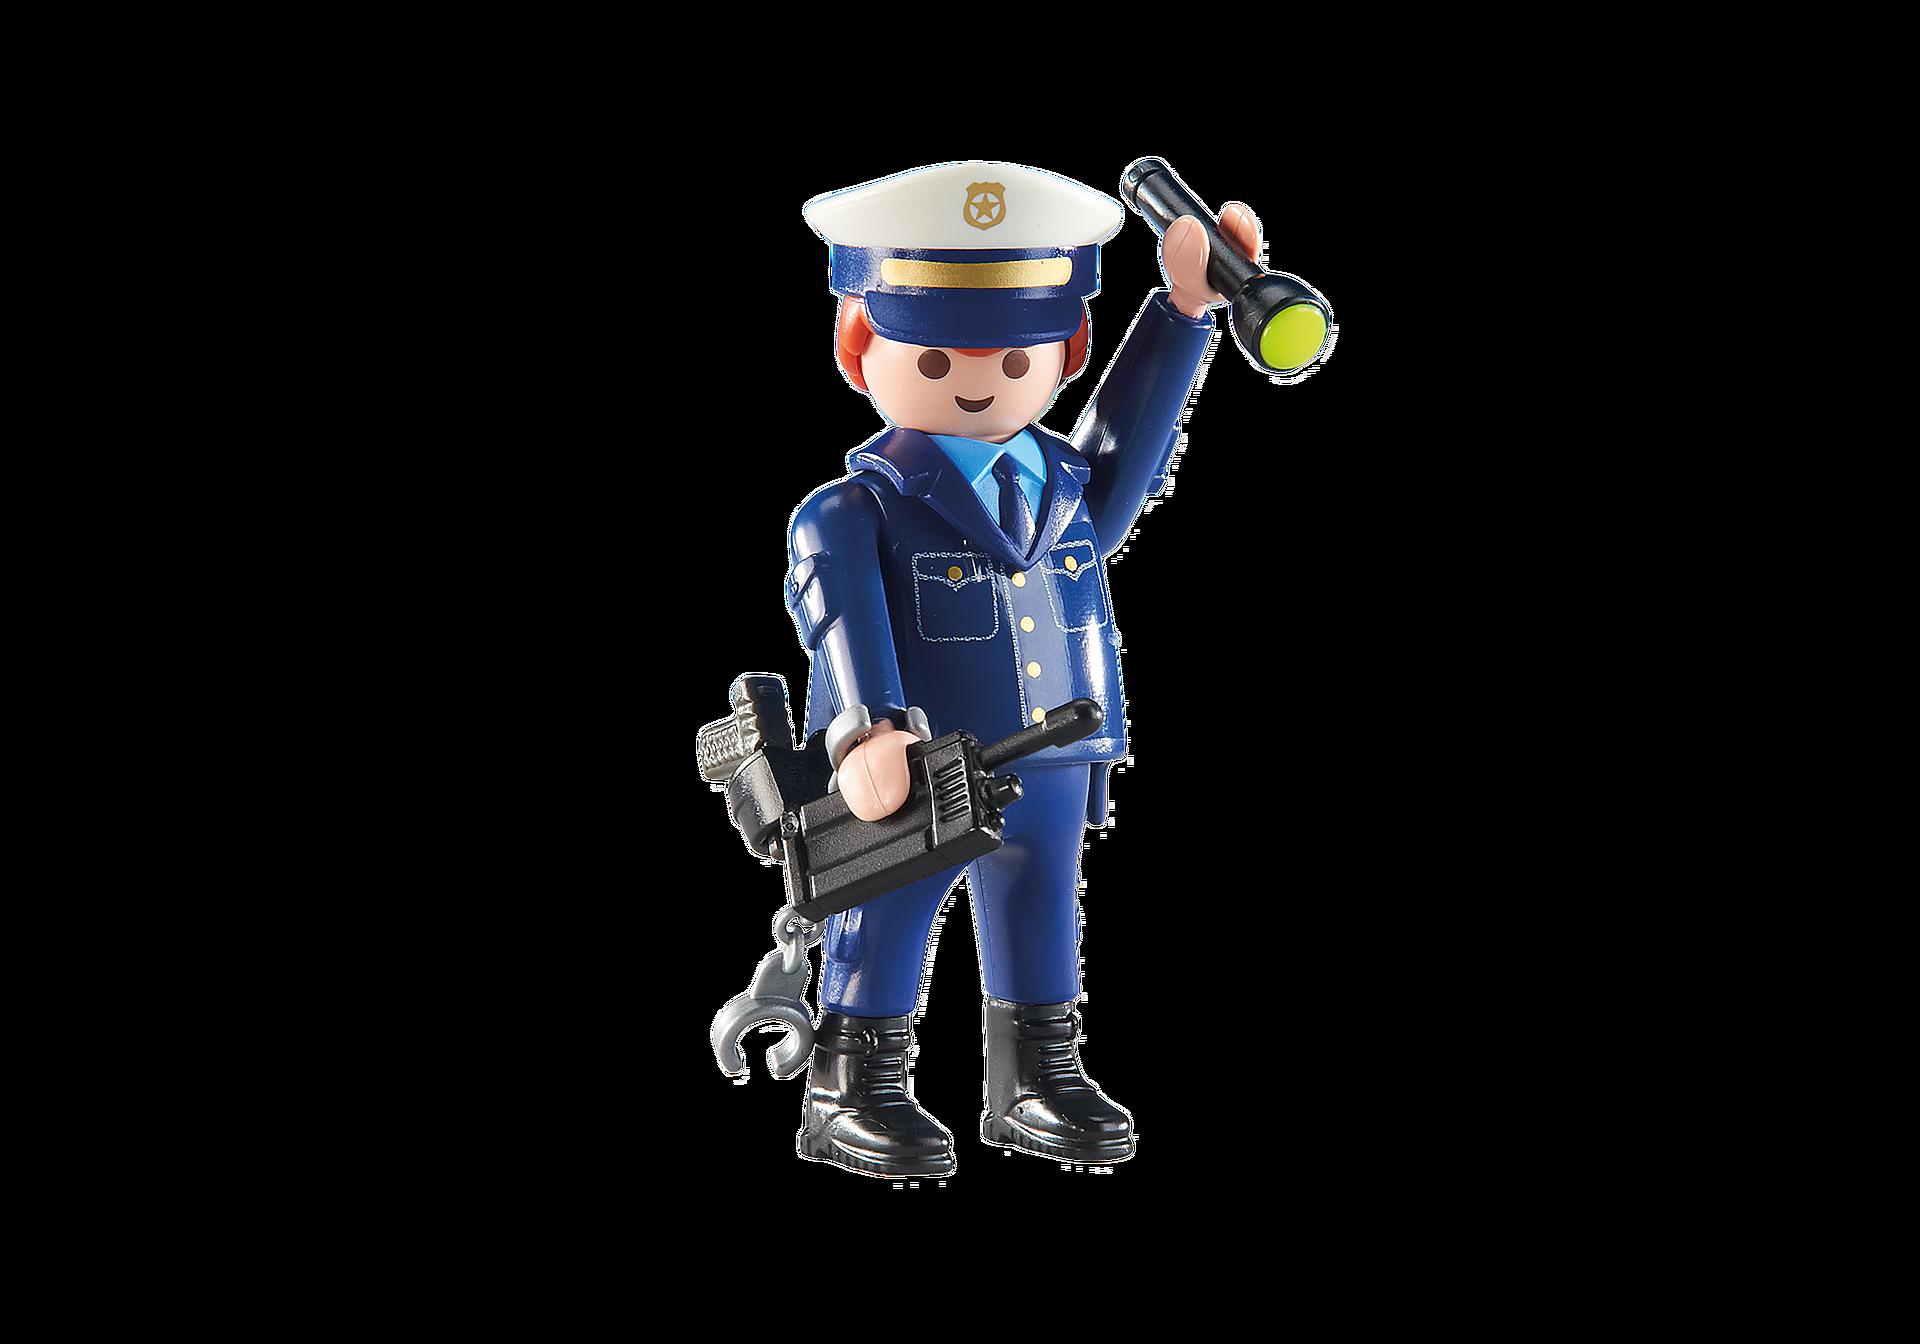 6502 Jefe Policía zoom image1